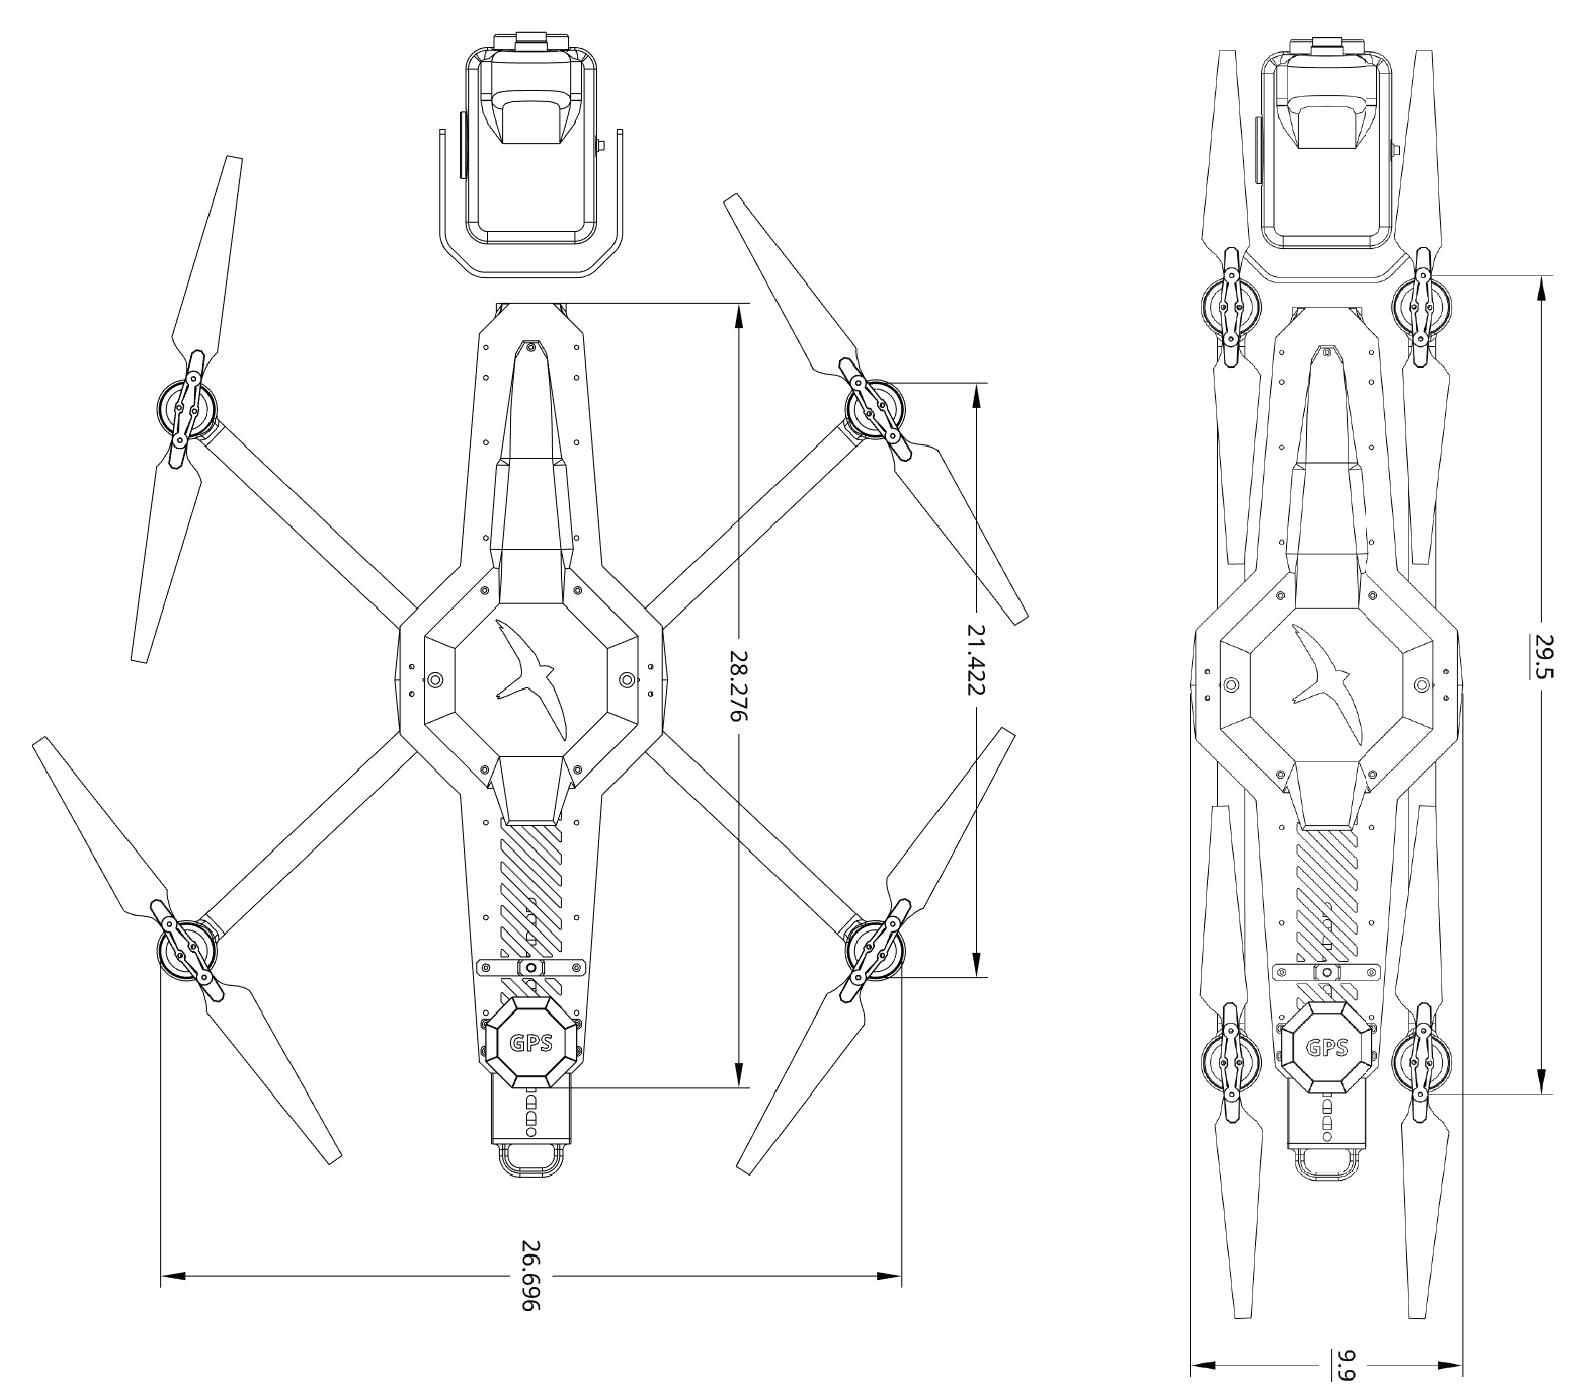 Measurements of Black Swift E2 quadcopter